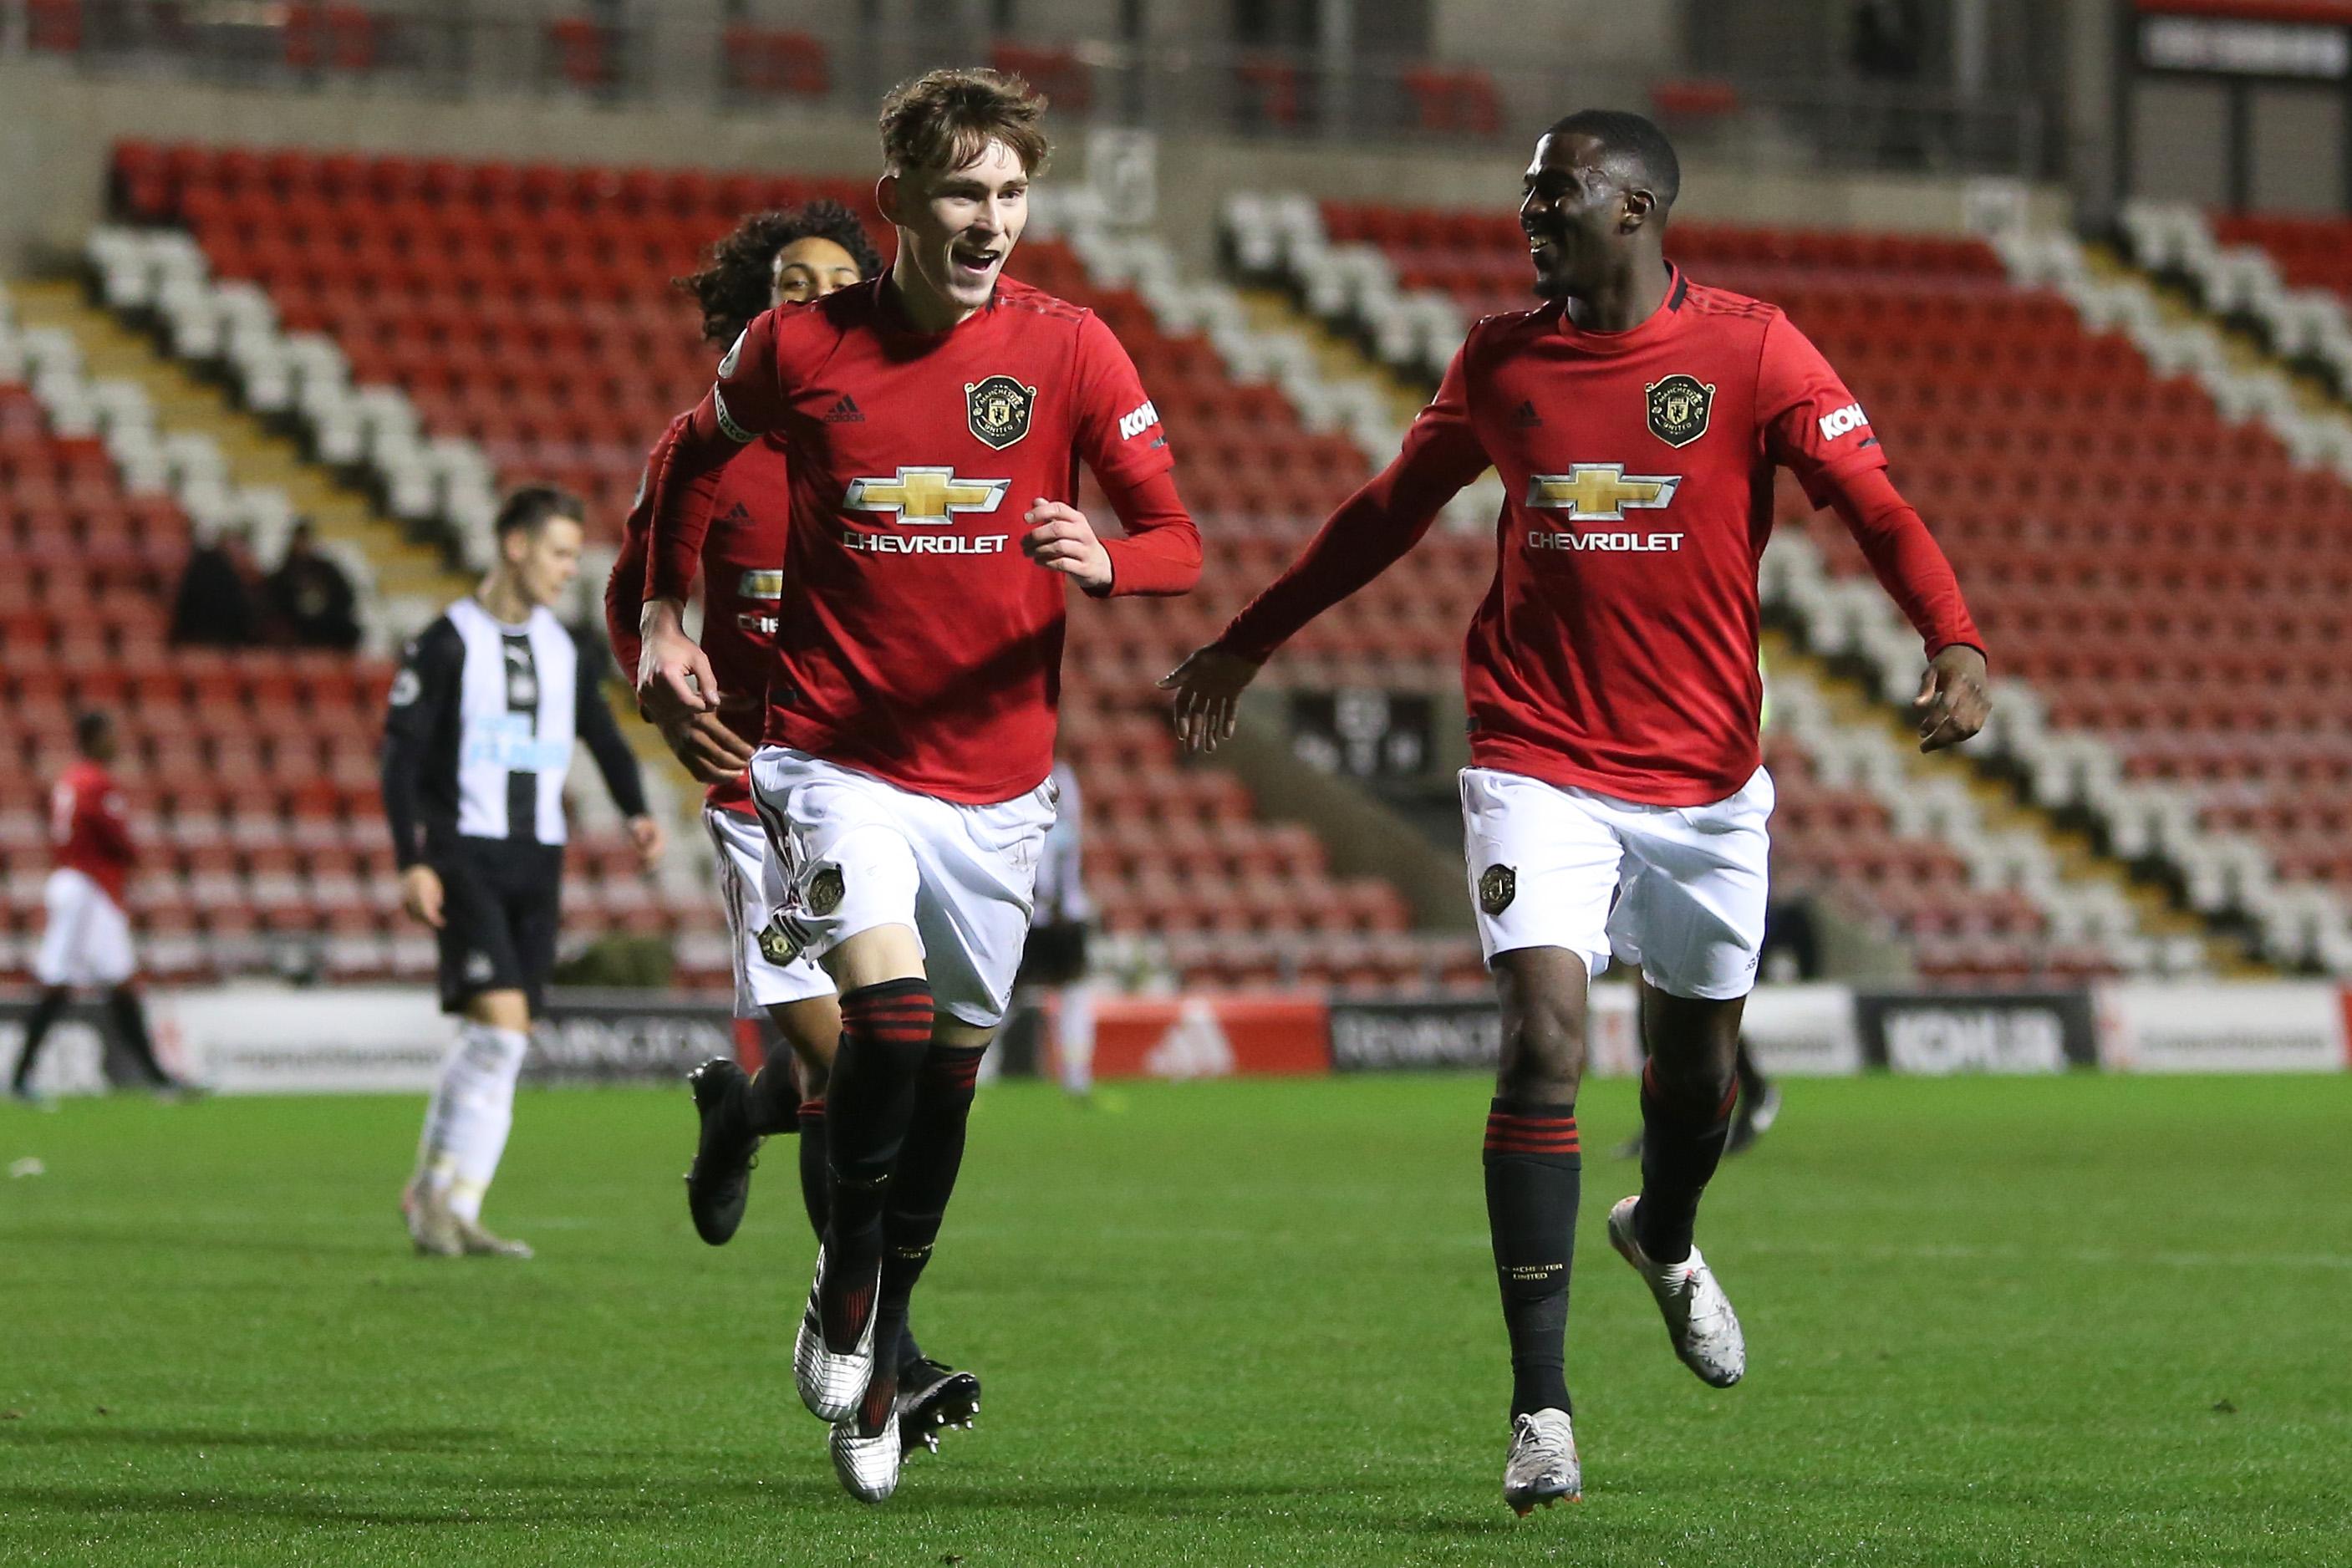 Manchester United v Newcastle United - Premier League 2